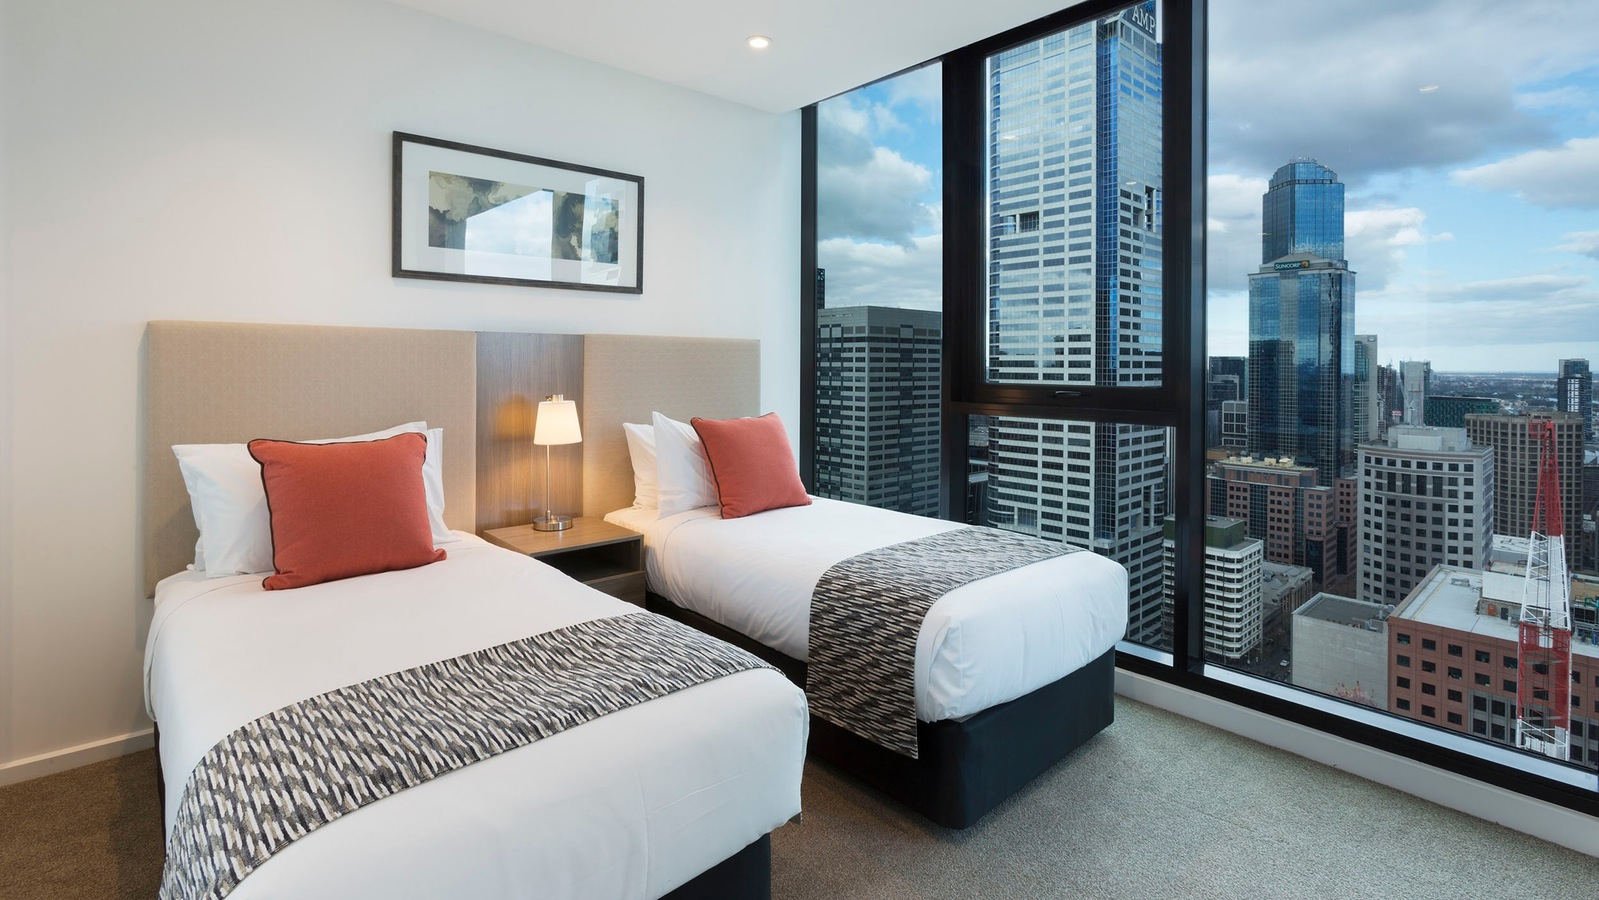 Melbourne Short Stay Apartments Lonsdale Street Accommodation Melbourne Victoria Australia